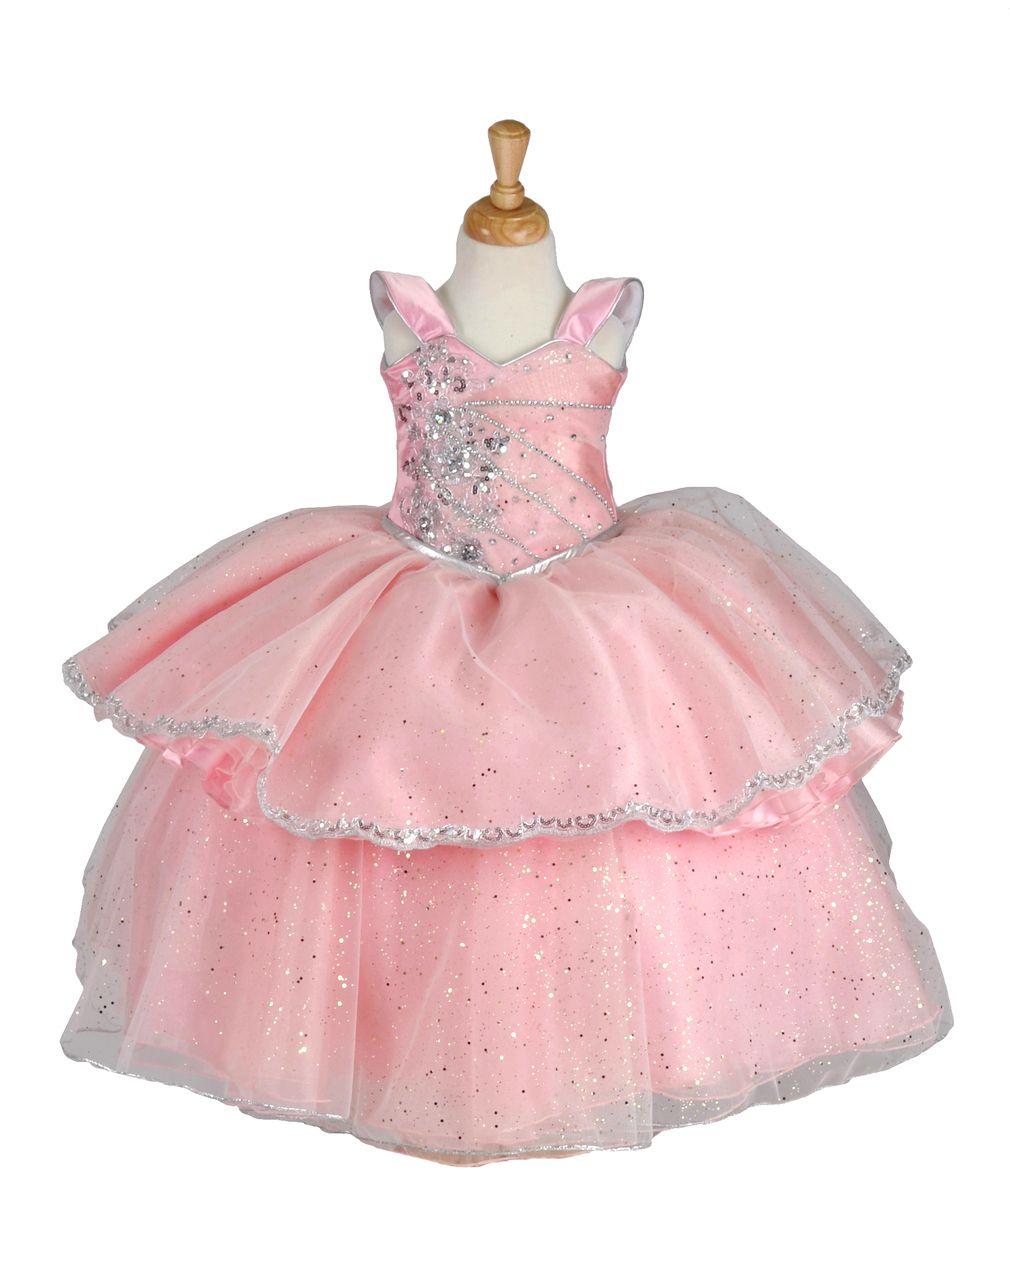 147c7f828 Flower girl 2 piece dress with long and short mini skirt  fgd073   joyfuleventsstore